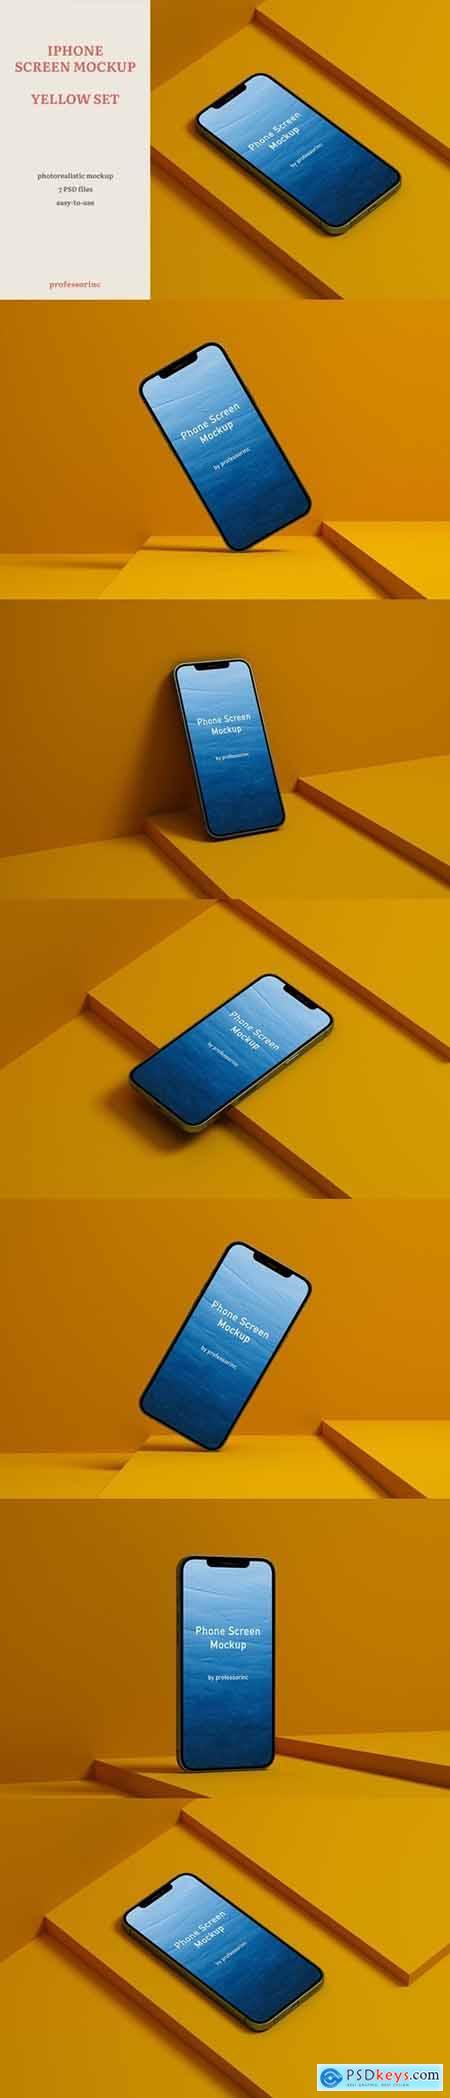 iPhone Screen Mockup — Yellow Set